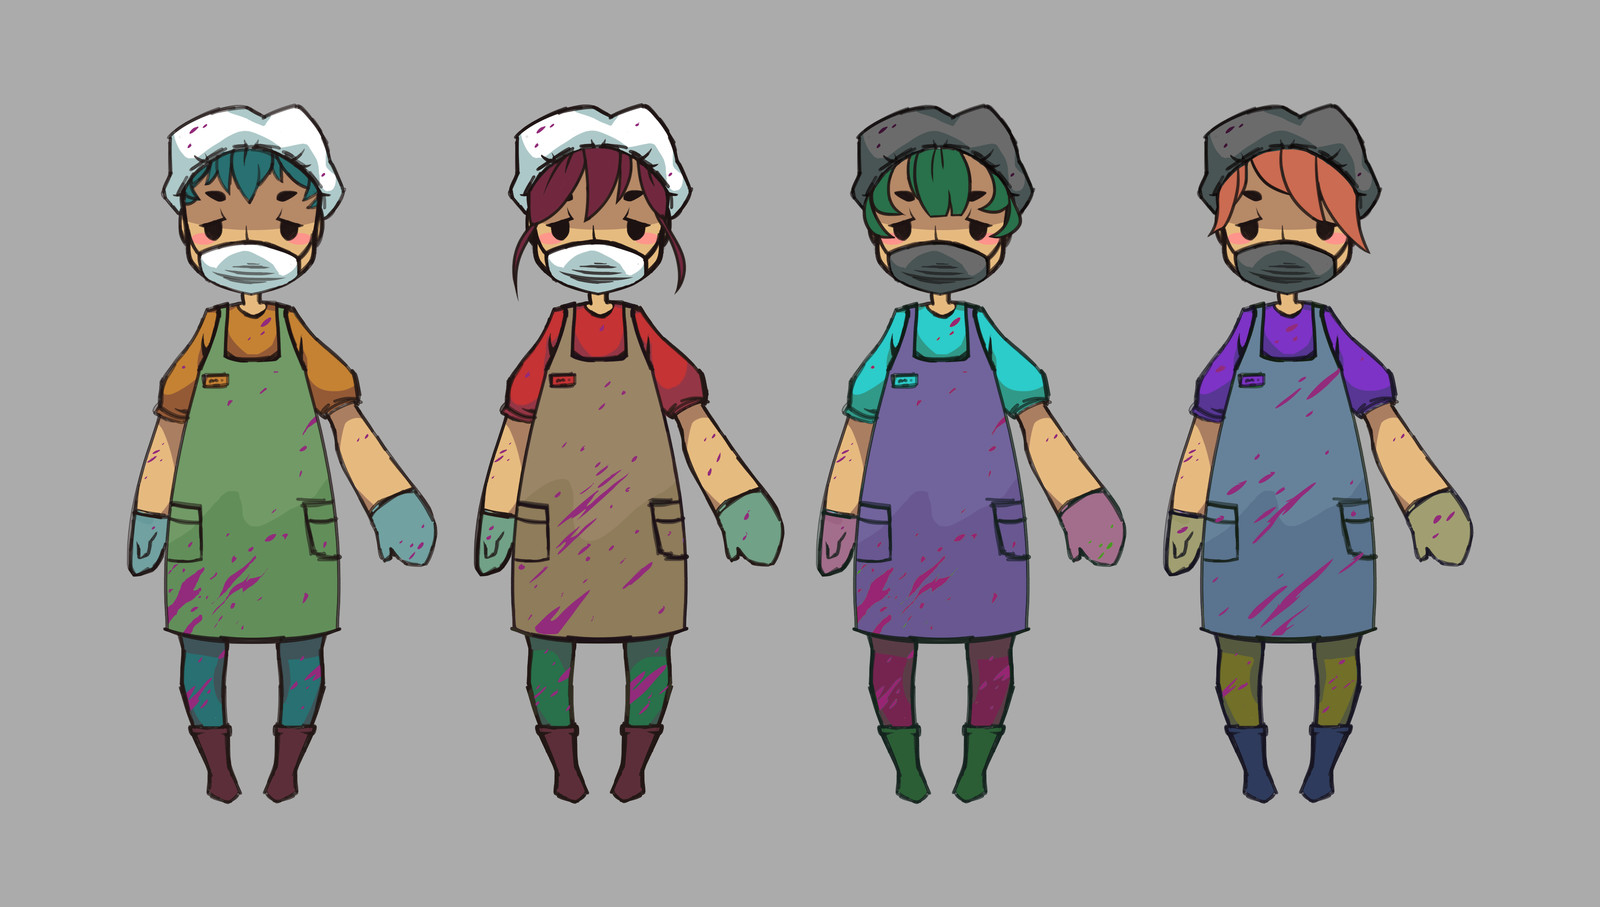 Final Four Designs